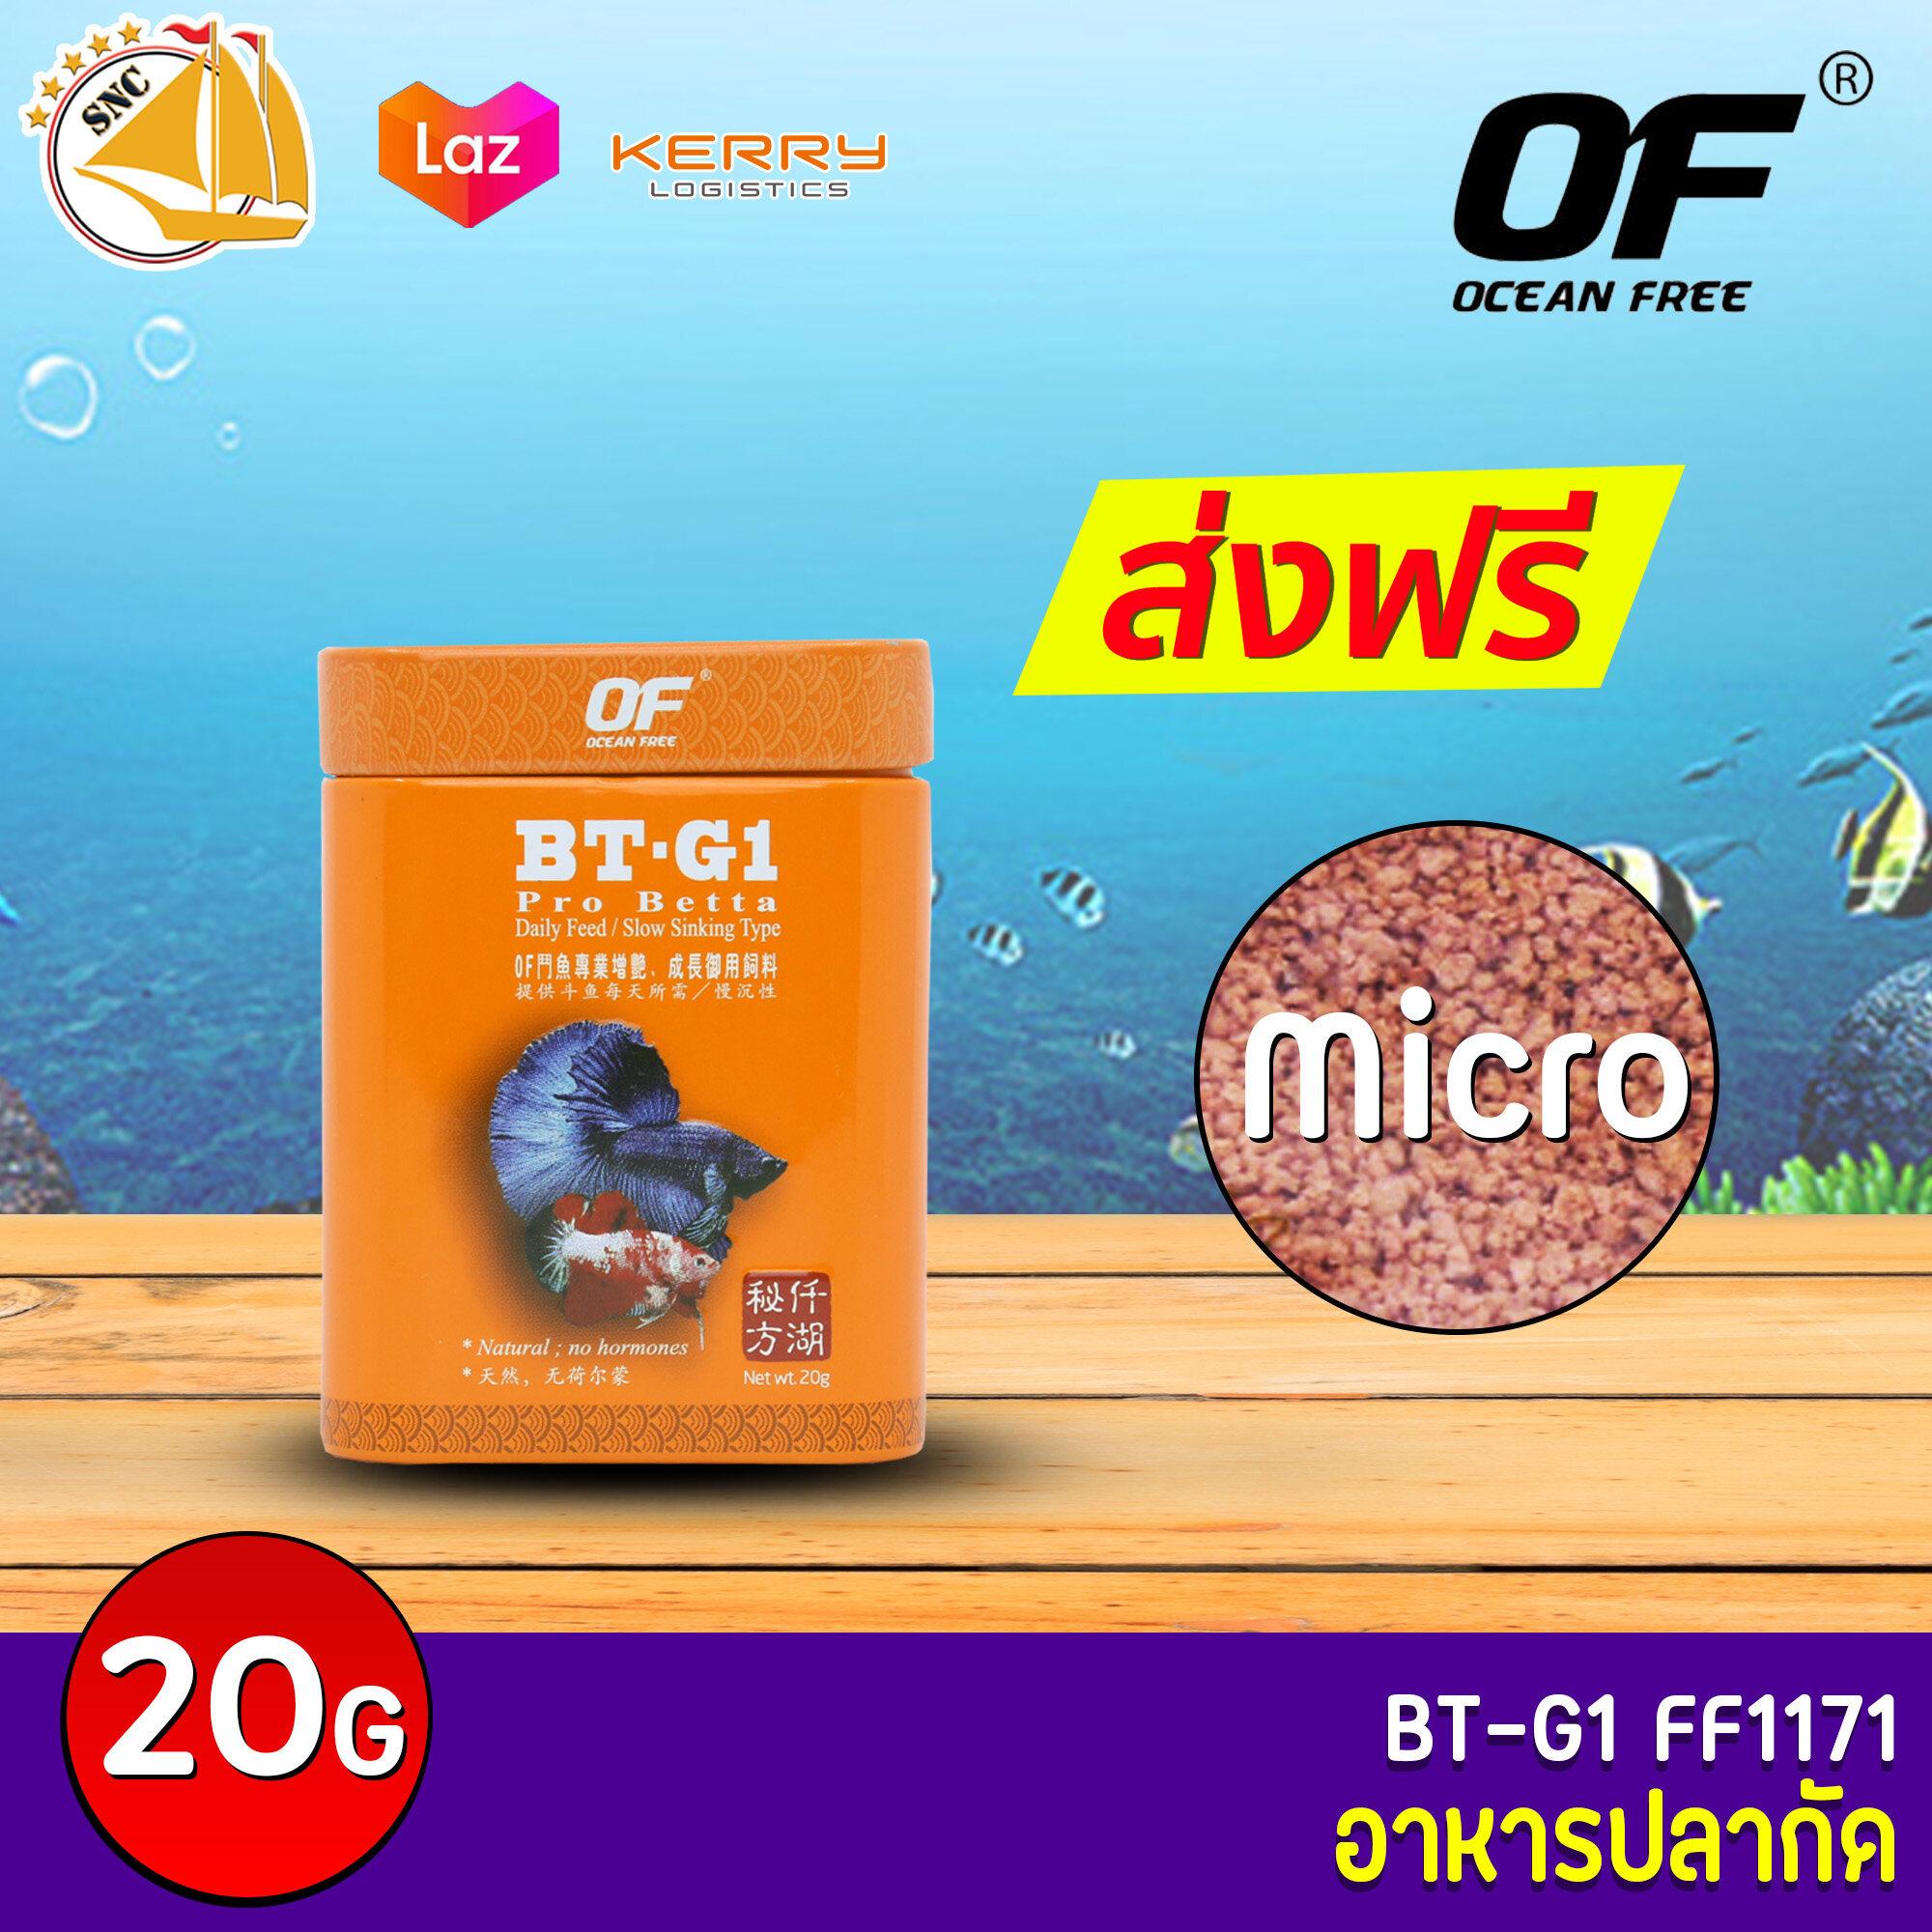 OF BT-G1 PRO BETTA อาหารปลากัด เร่งสี เร่งโต น้ำไม่เน่าเสีย คุณภาพดี 20g ( เม็ด Micro )